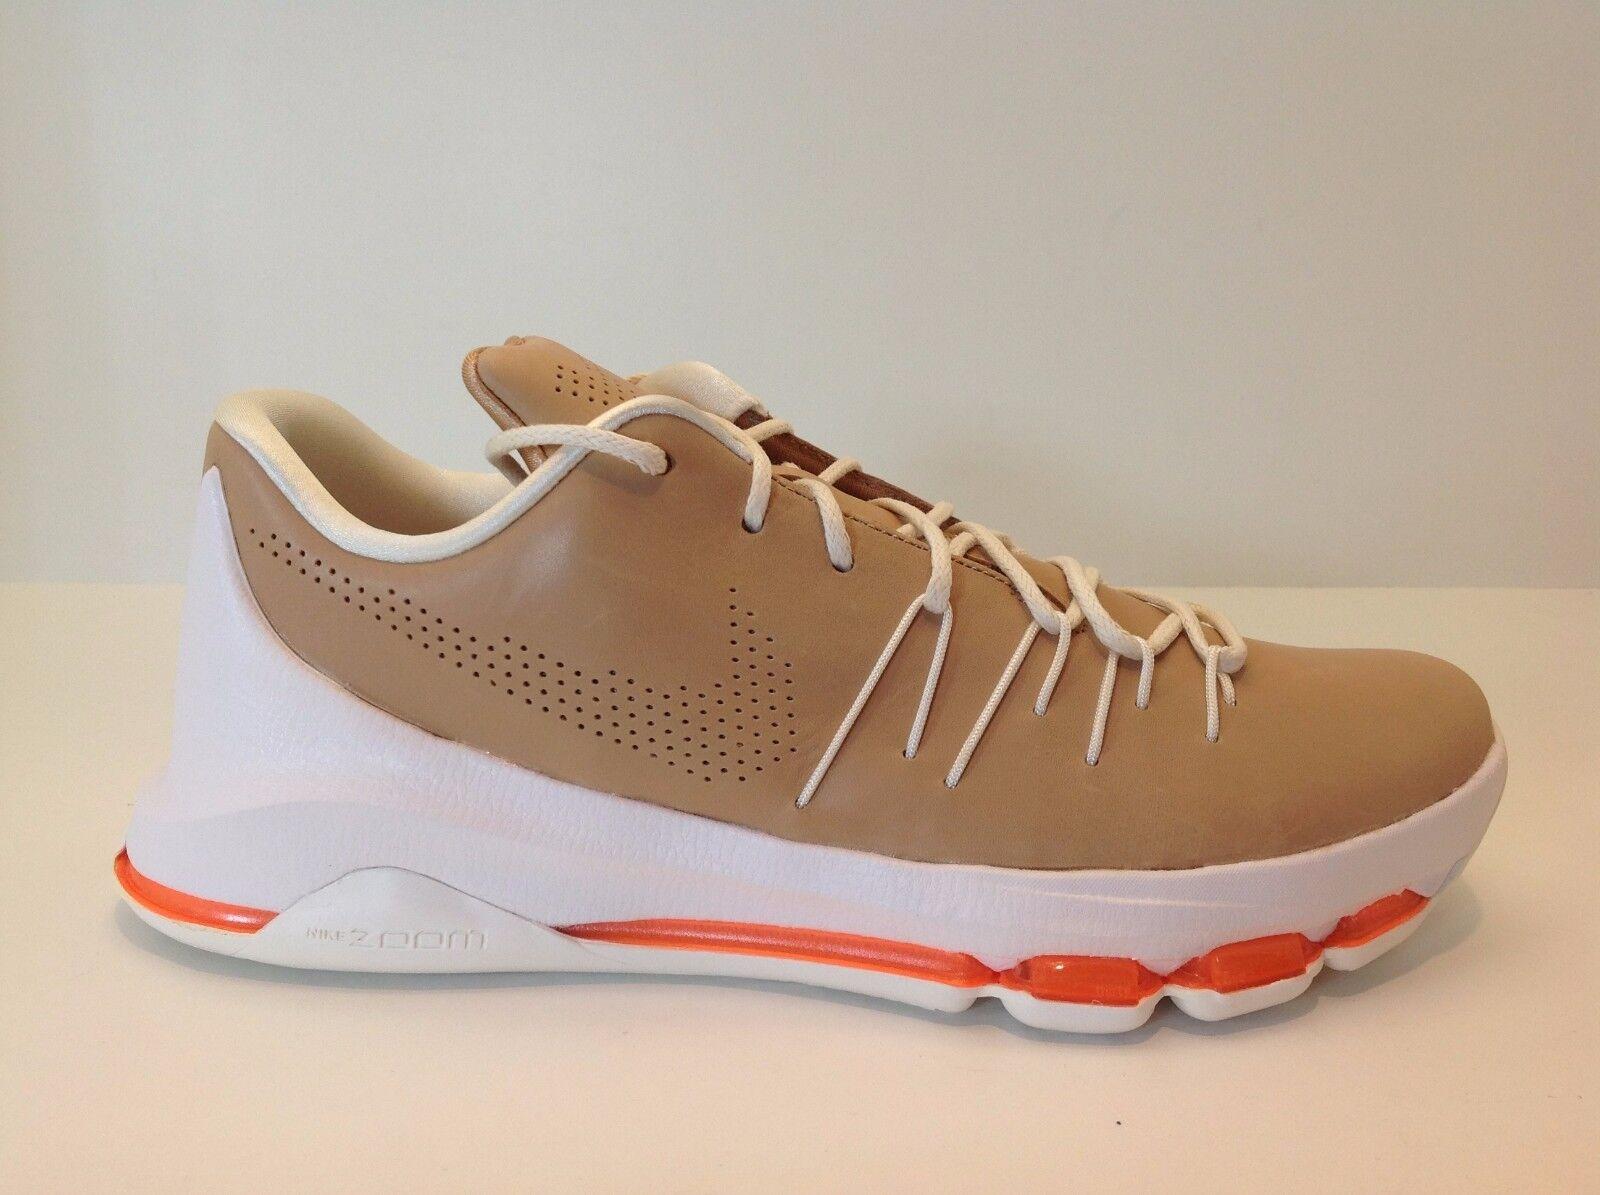 Nike KD 8 EXT EXT EXT Tan orange White Men's Basketball Size 10 New in Box 806393 200 25b131